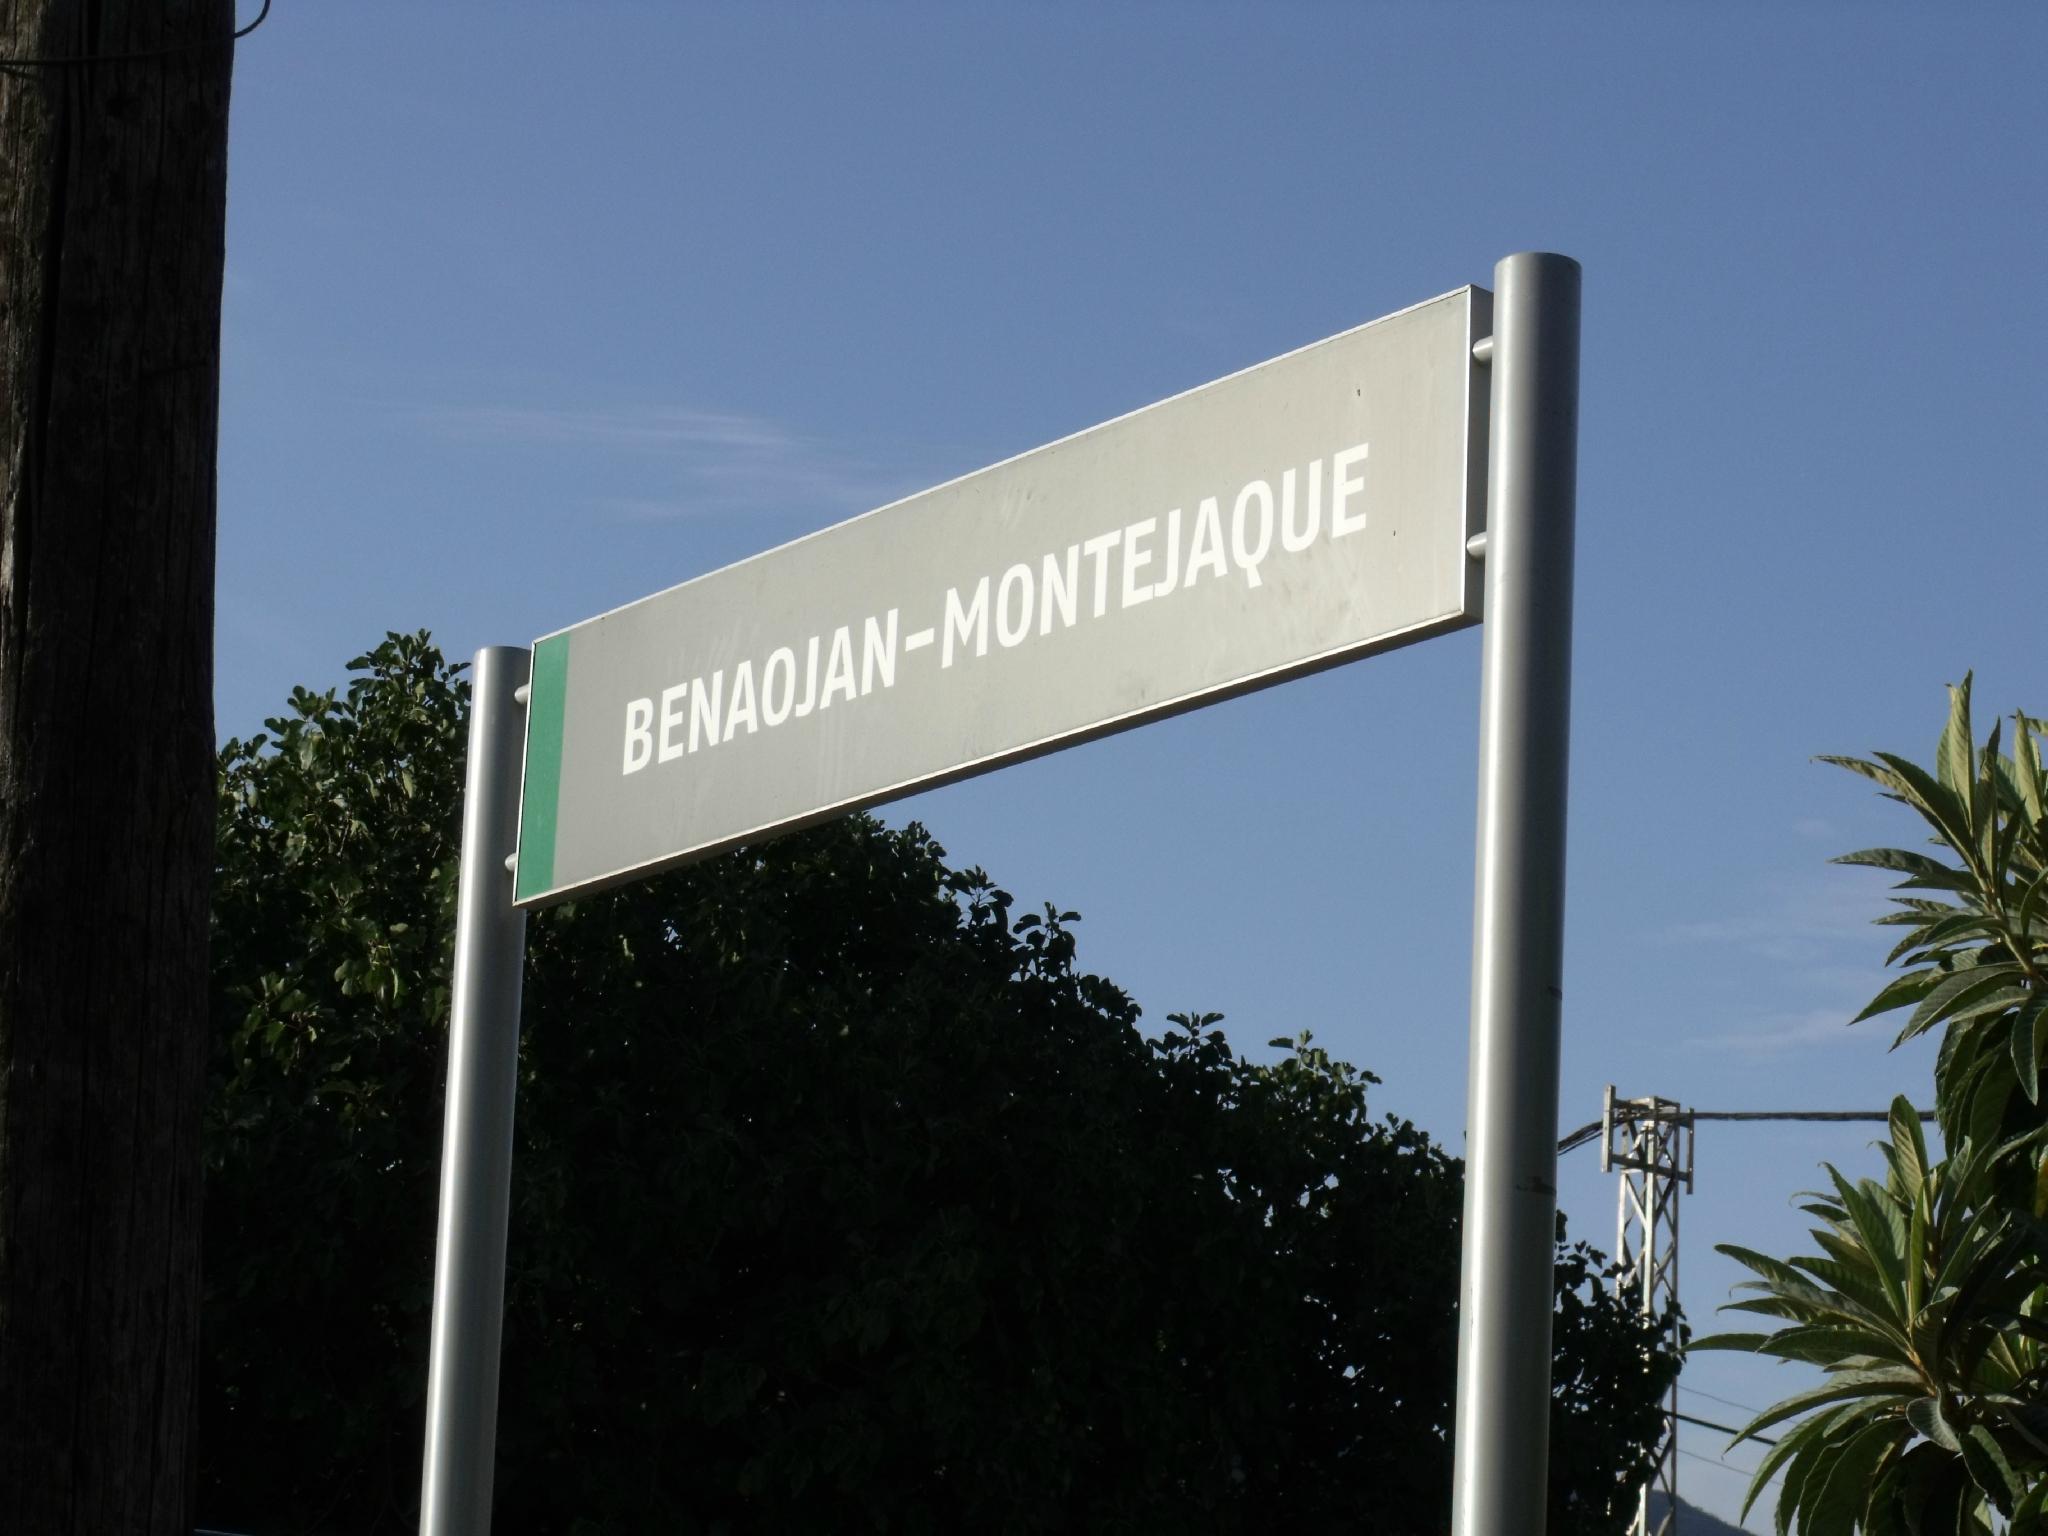 Benaoján-Montejaque (Espagne)